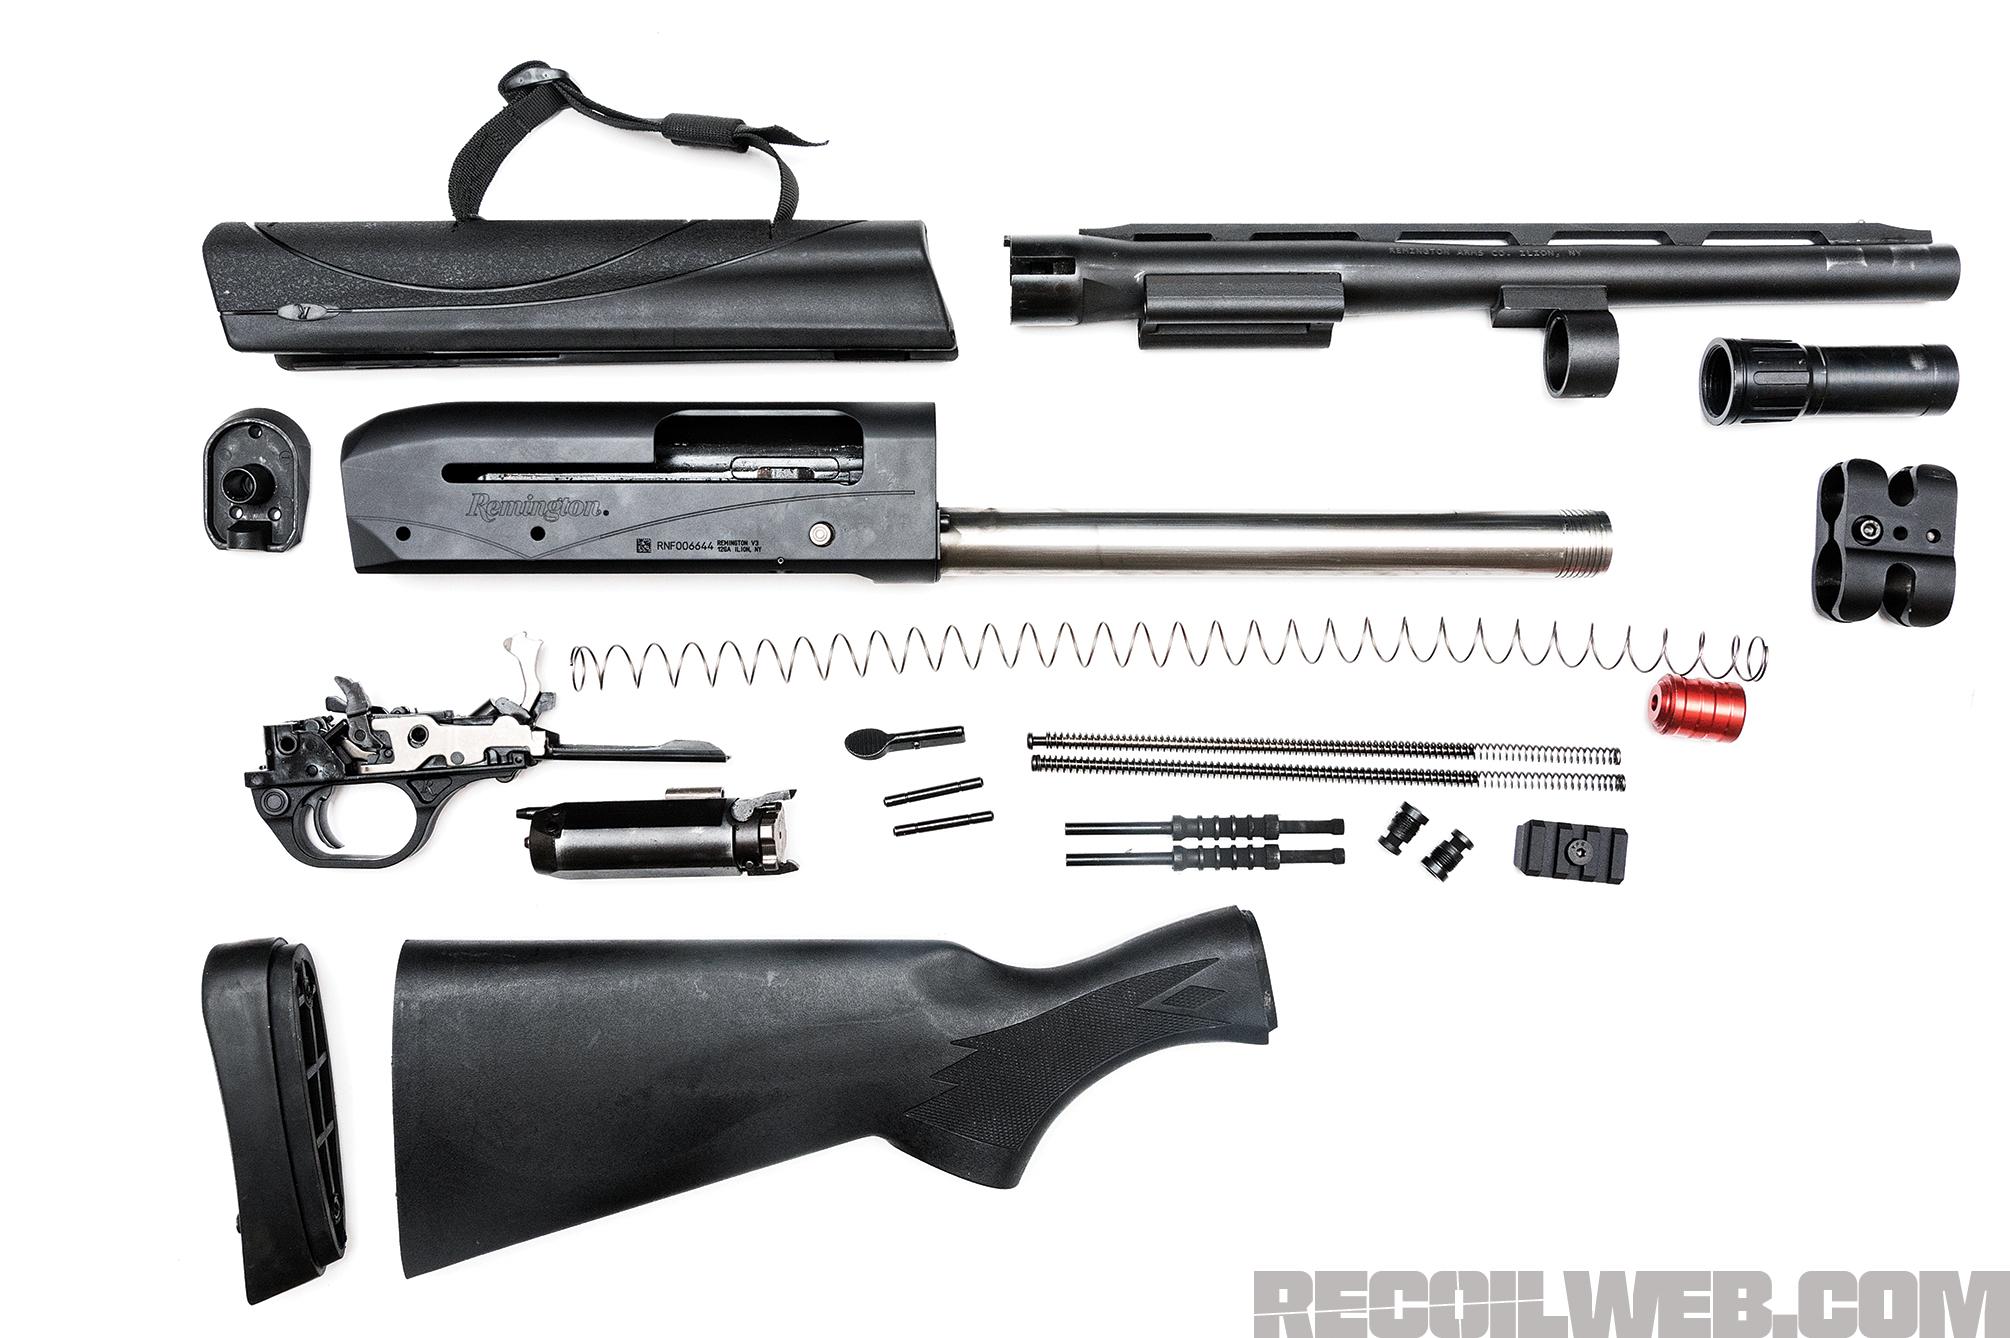 Remington V3 TAC-13 Short-Barreled Shotgun | RECOIL